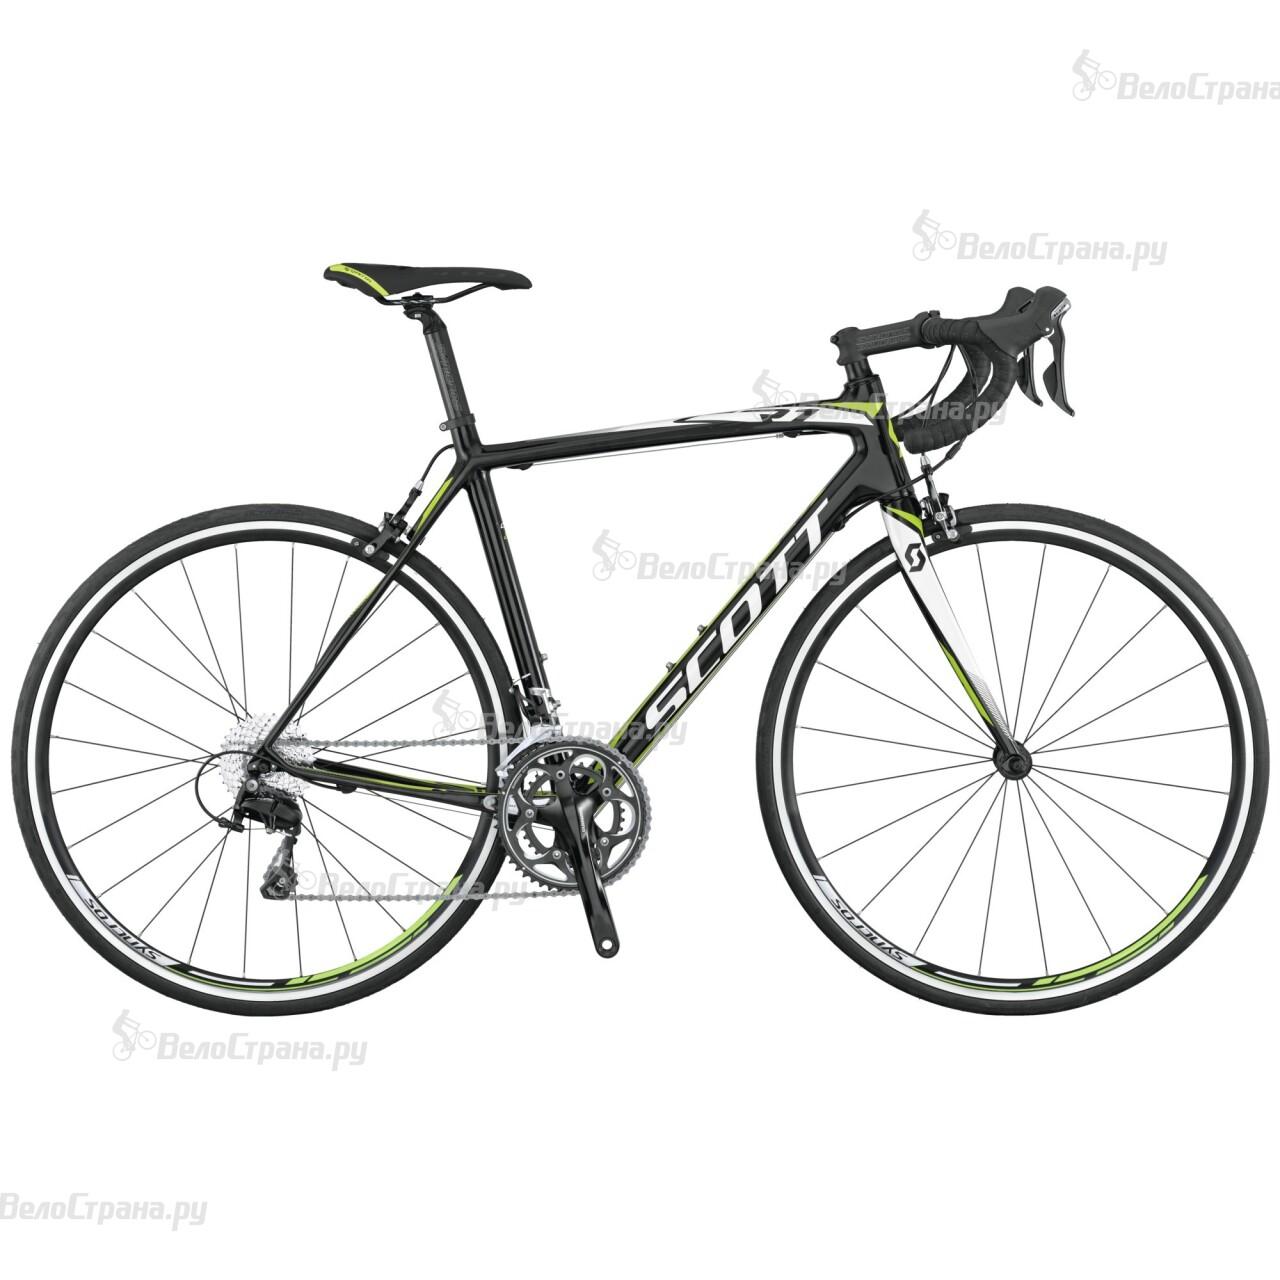 Велосипед Scott CR1 20 (2015) велосипед scott cr1 20 2017